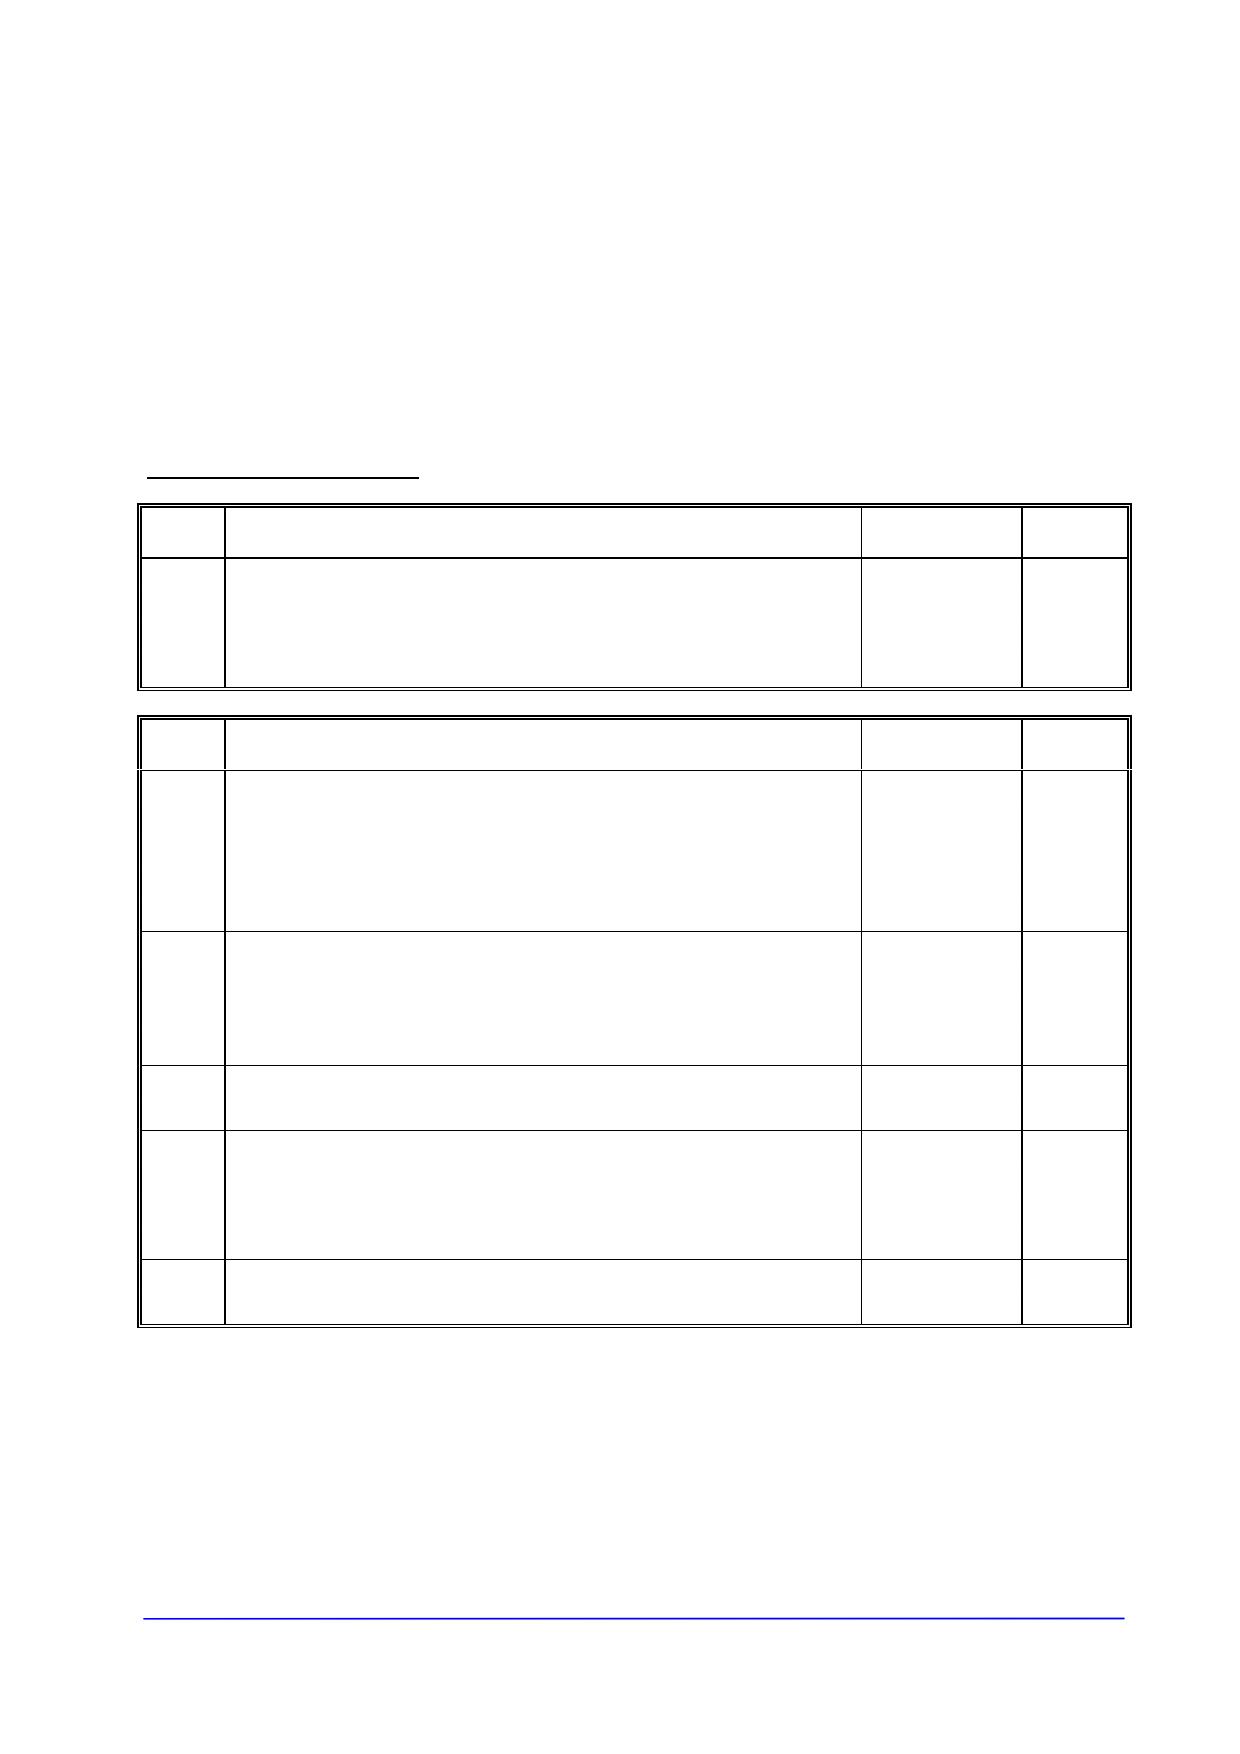 R0577YS10E datasheet